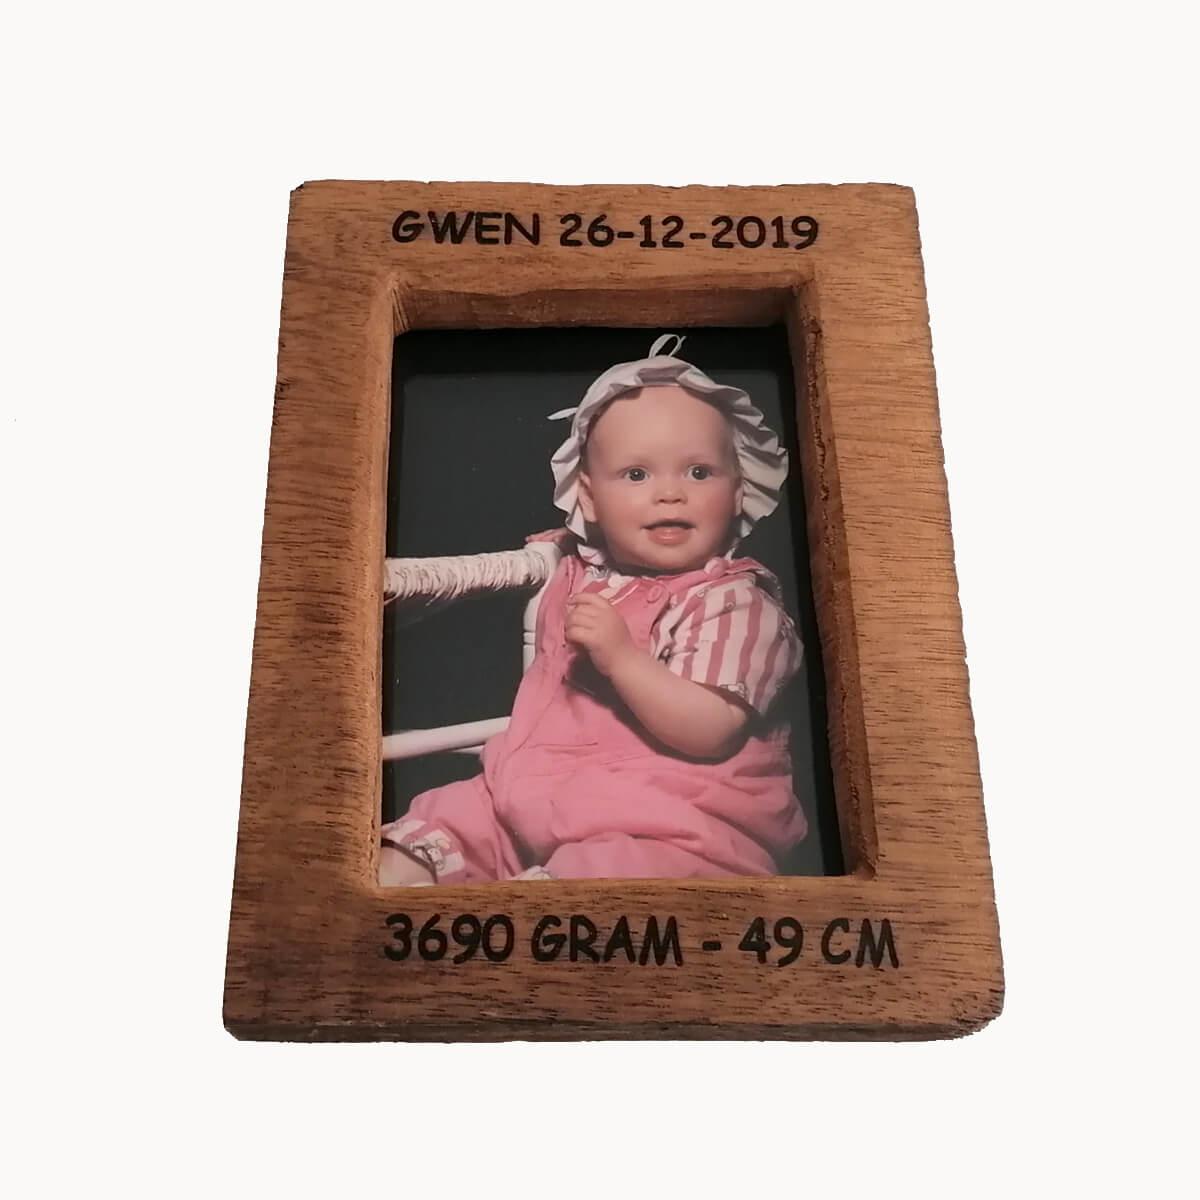 Baby cadeau: fotolijst met foto en alle geboorte gegevens